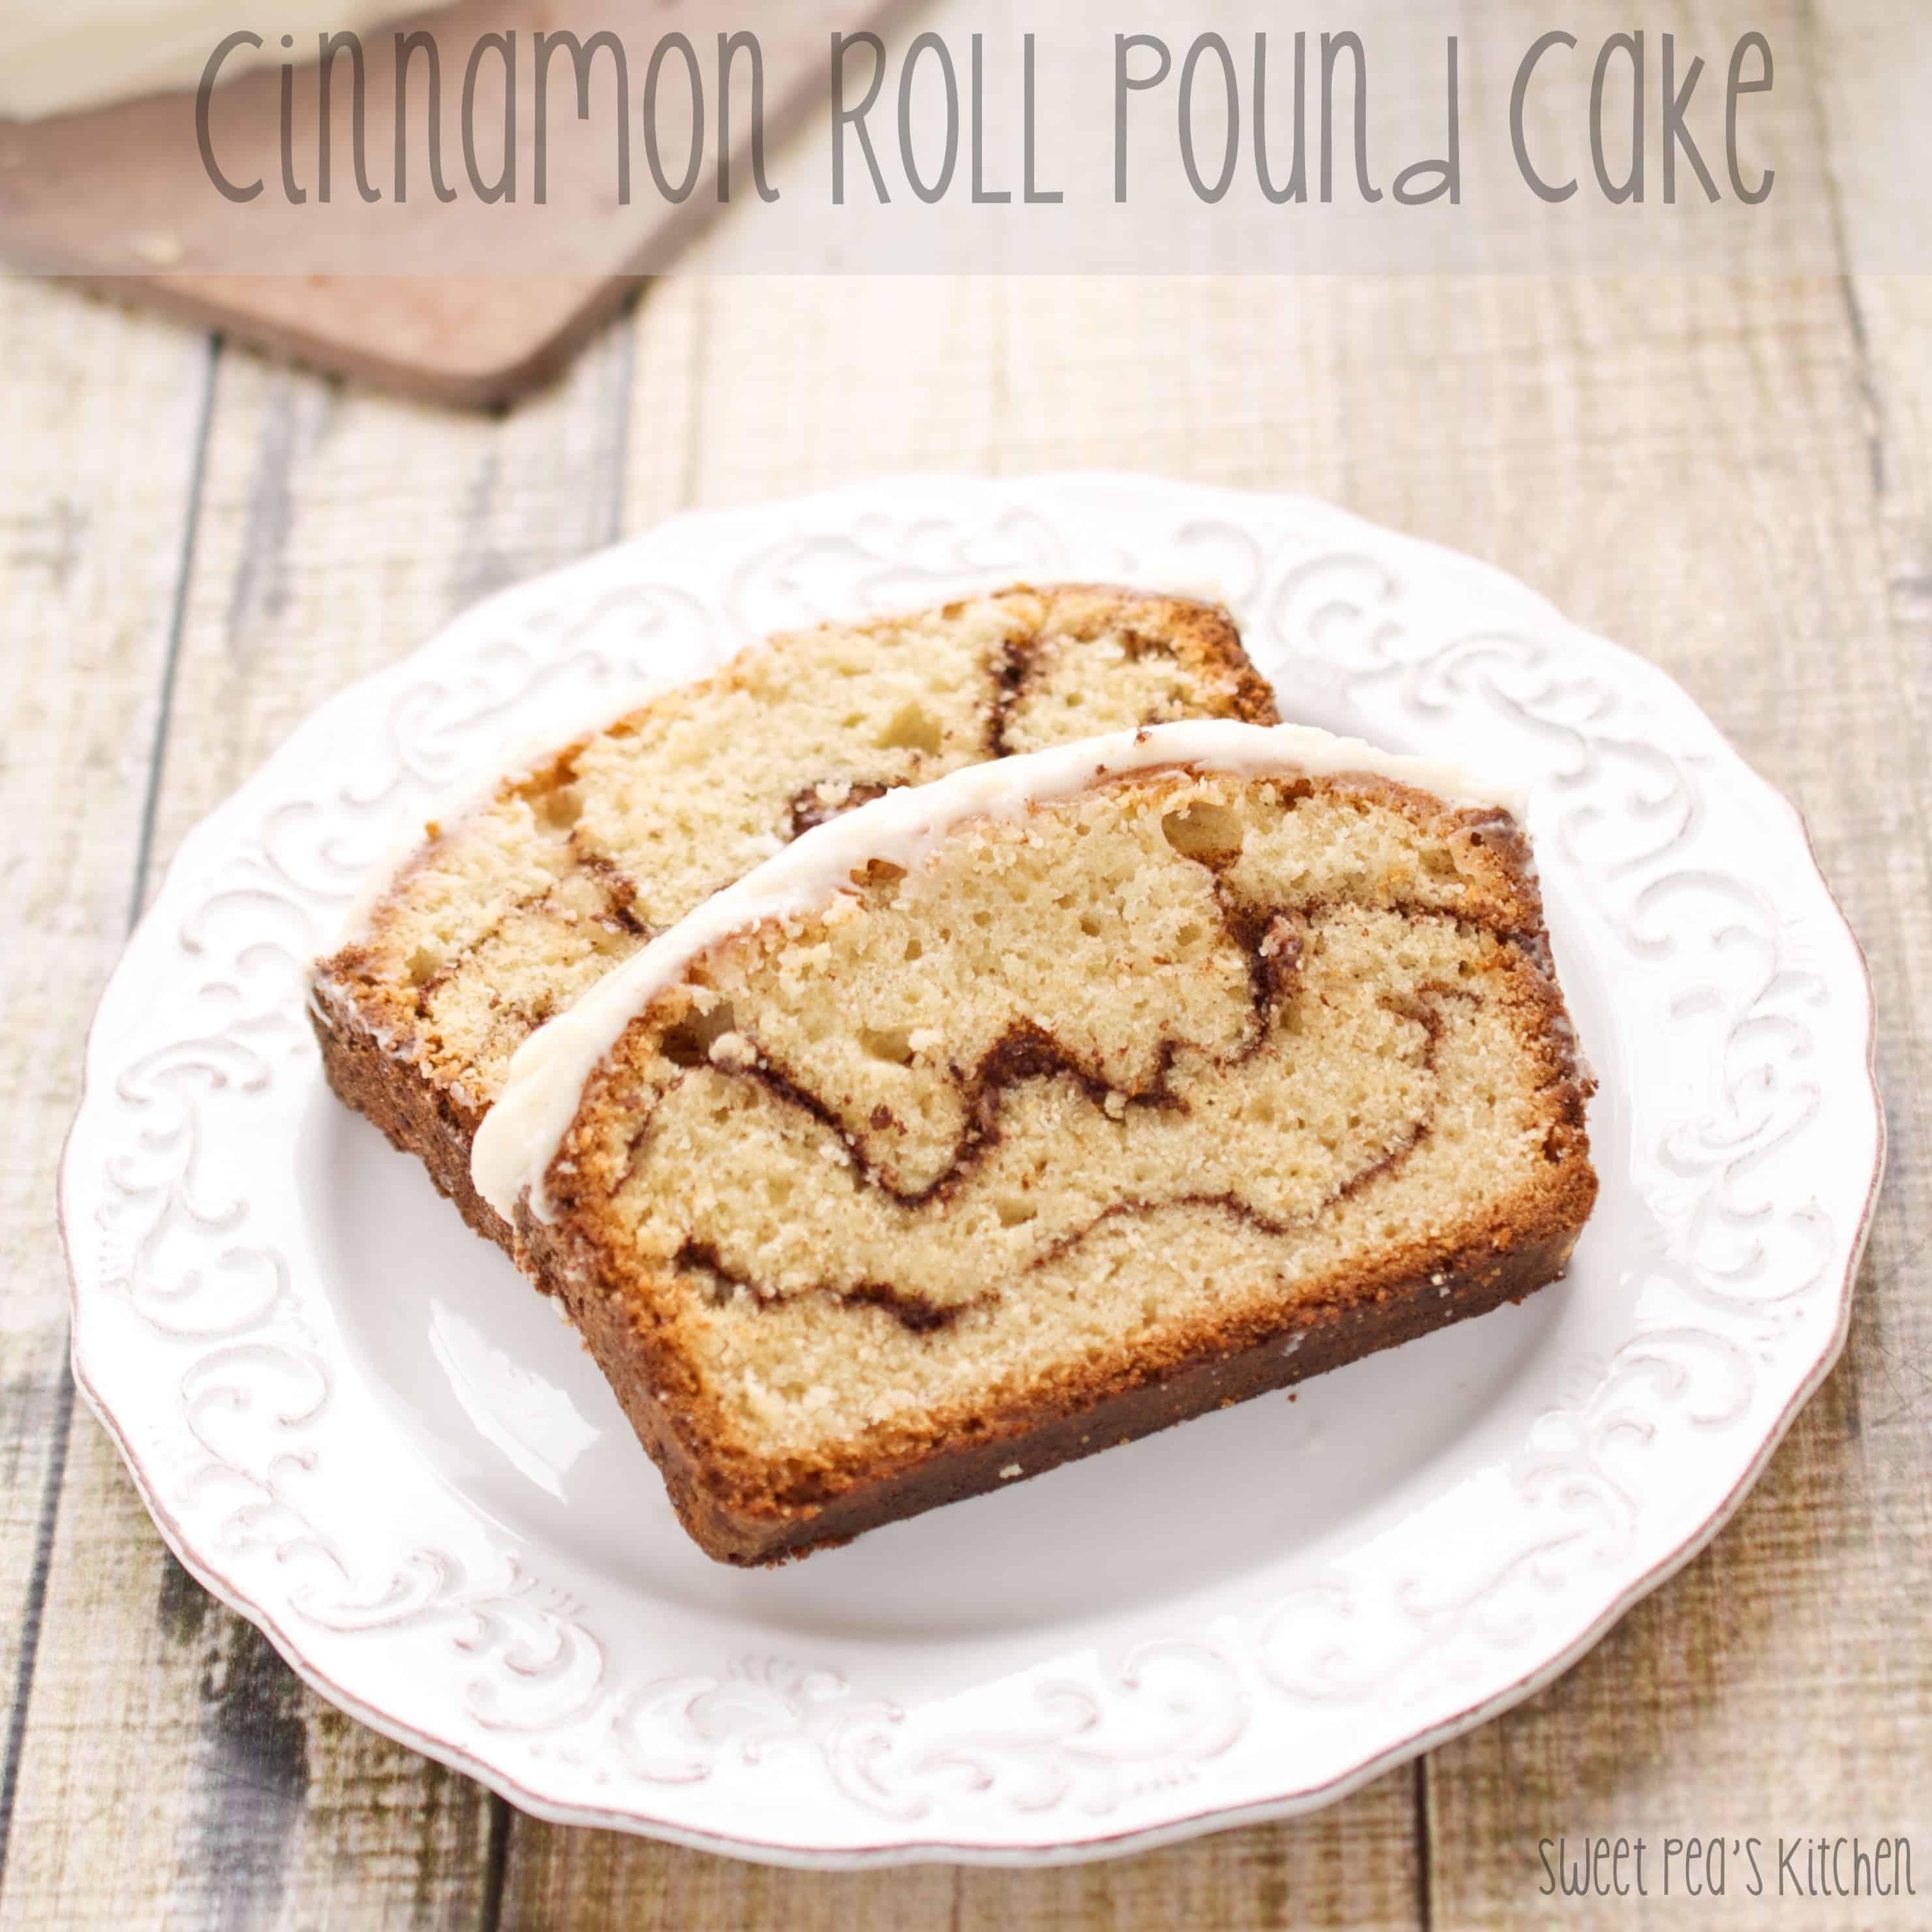 cinnamon roll pound cake on plate